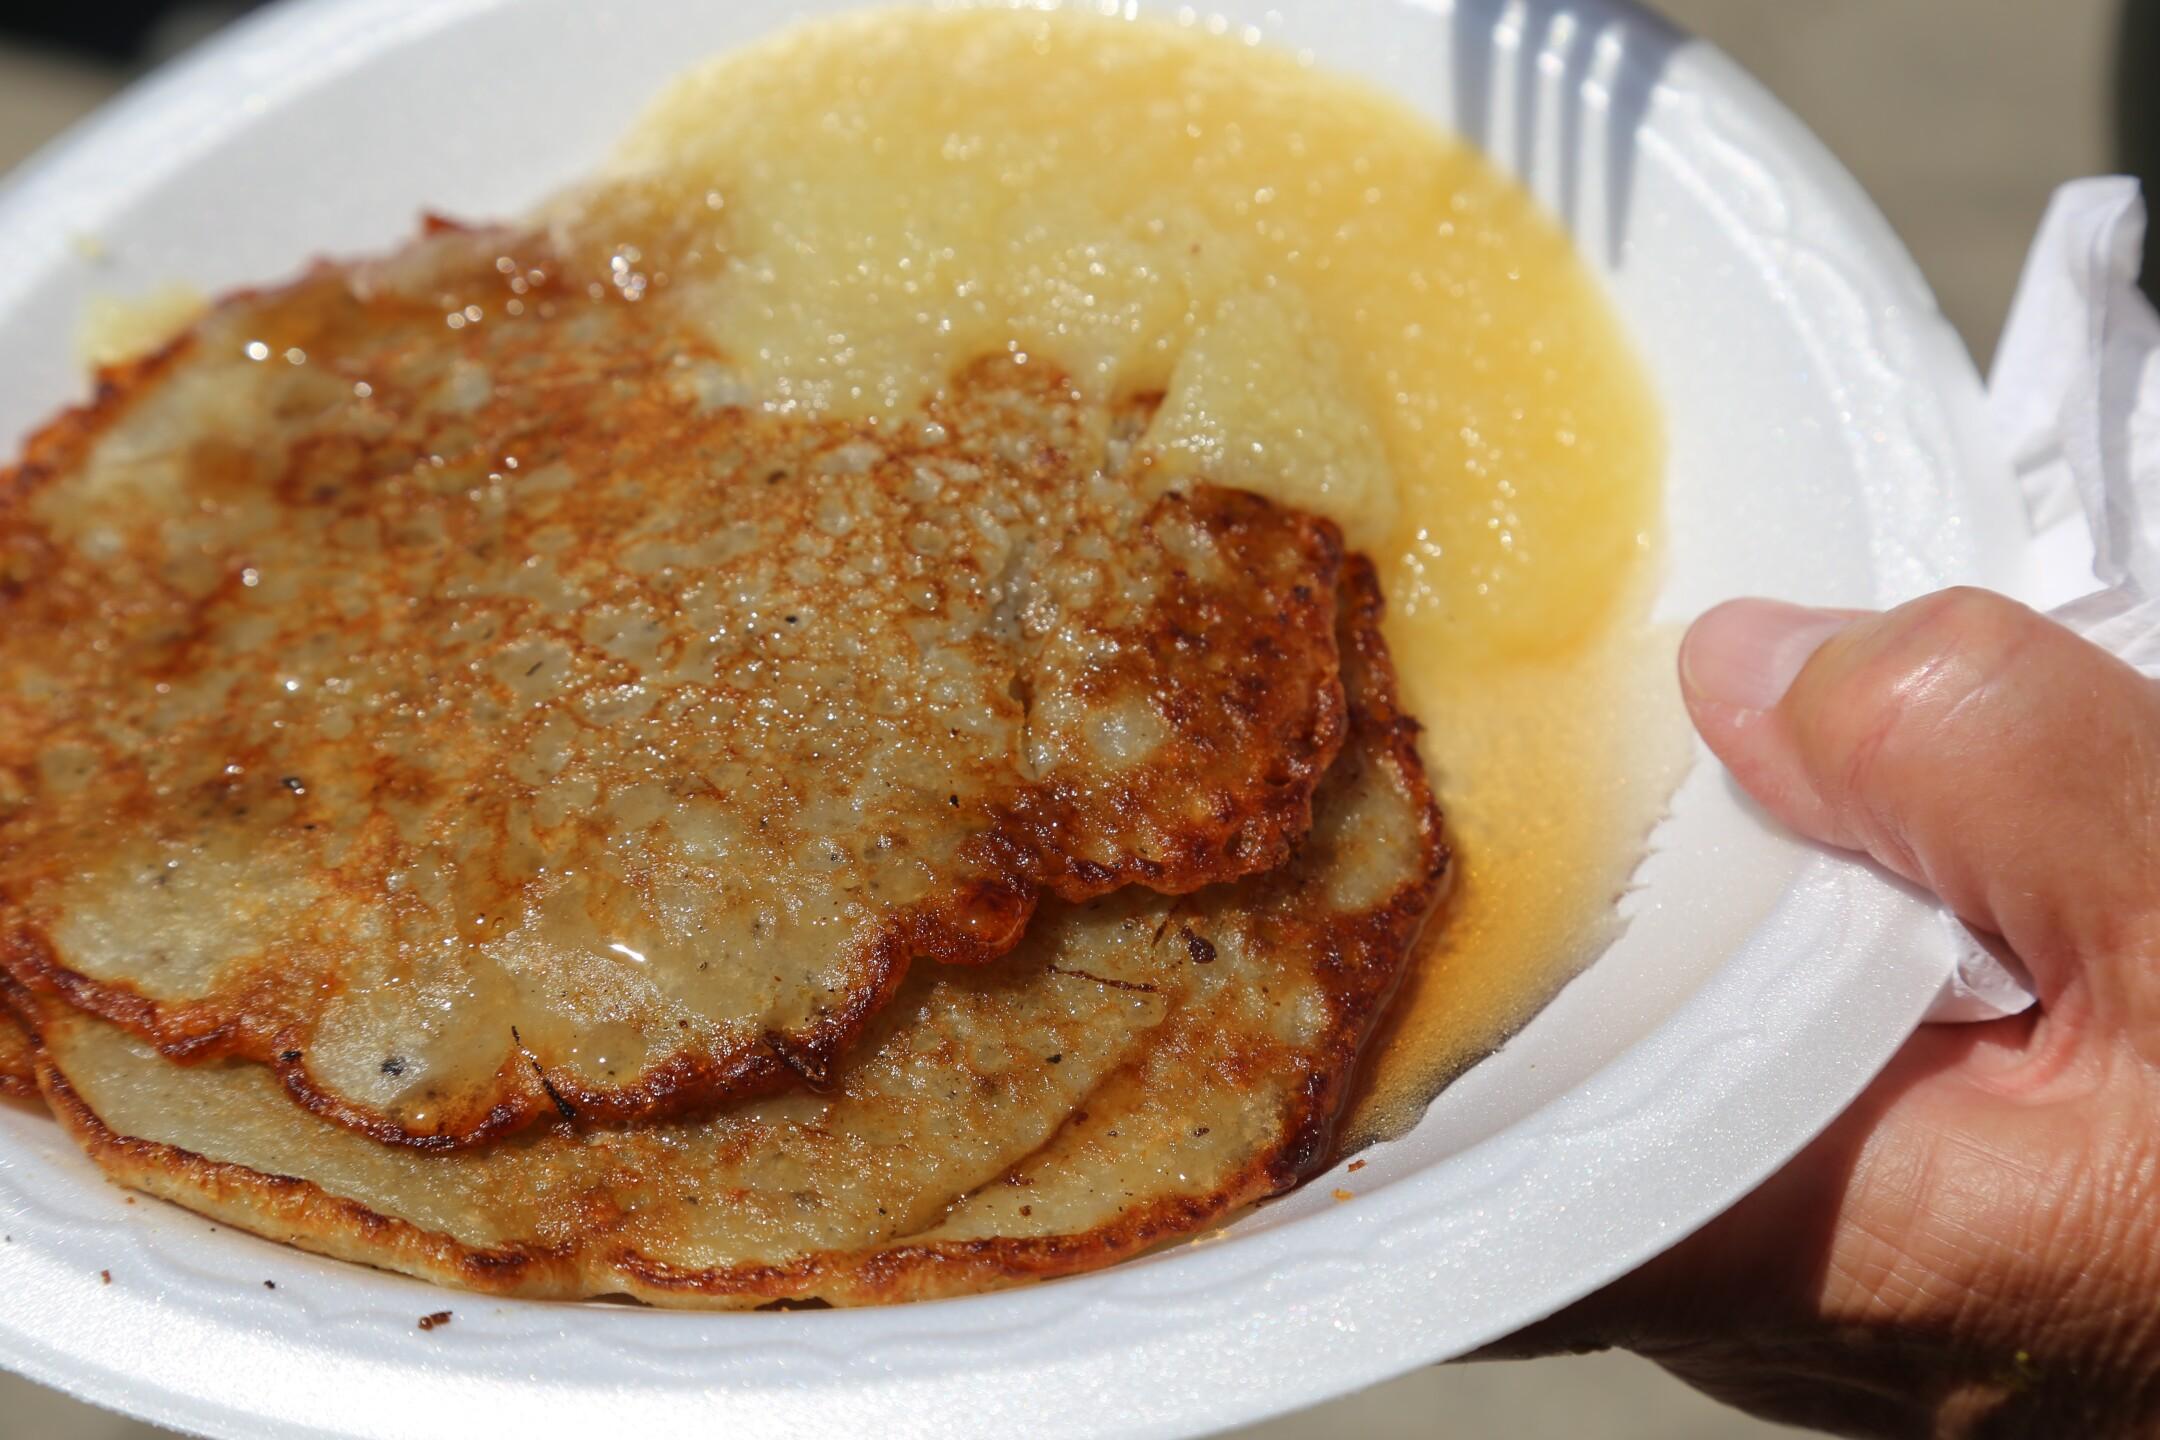 Potato Pancake and Apple sauce